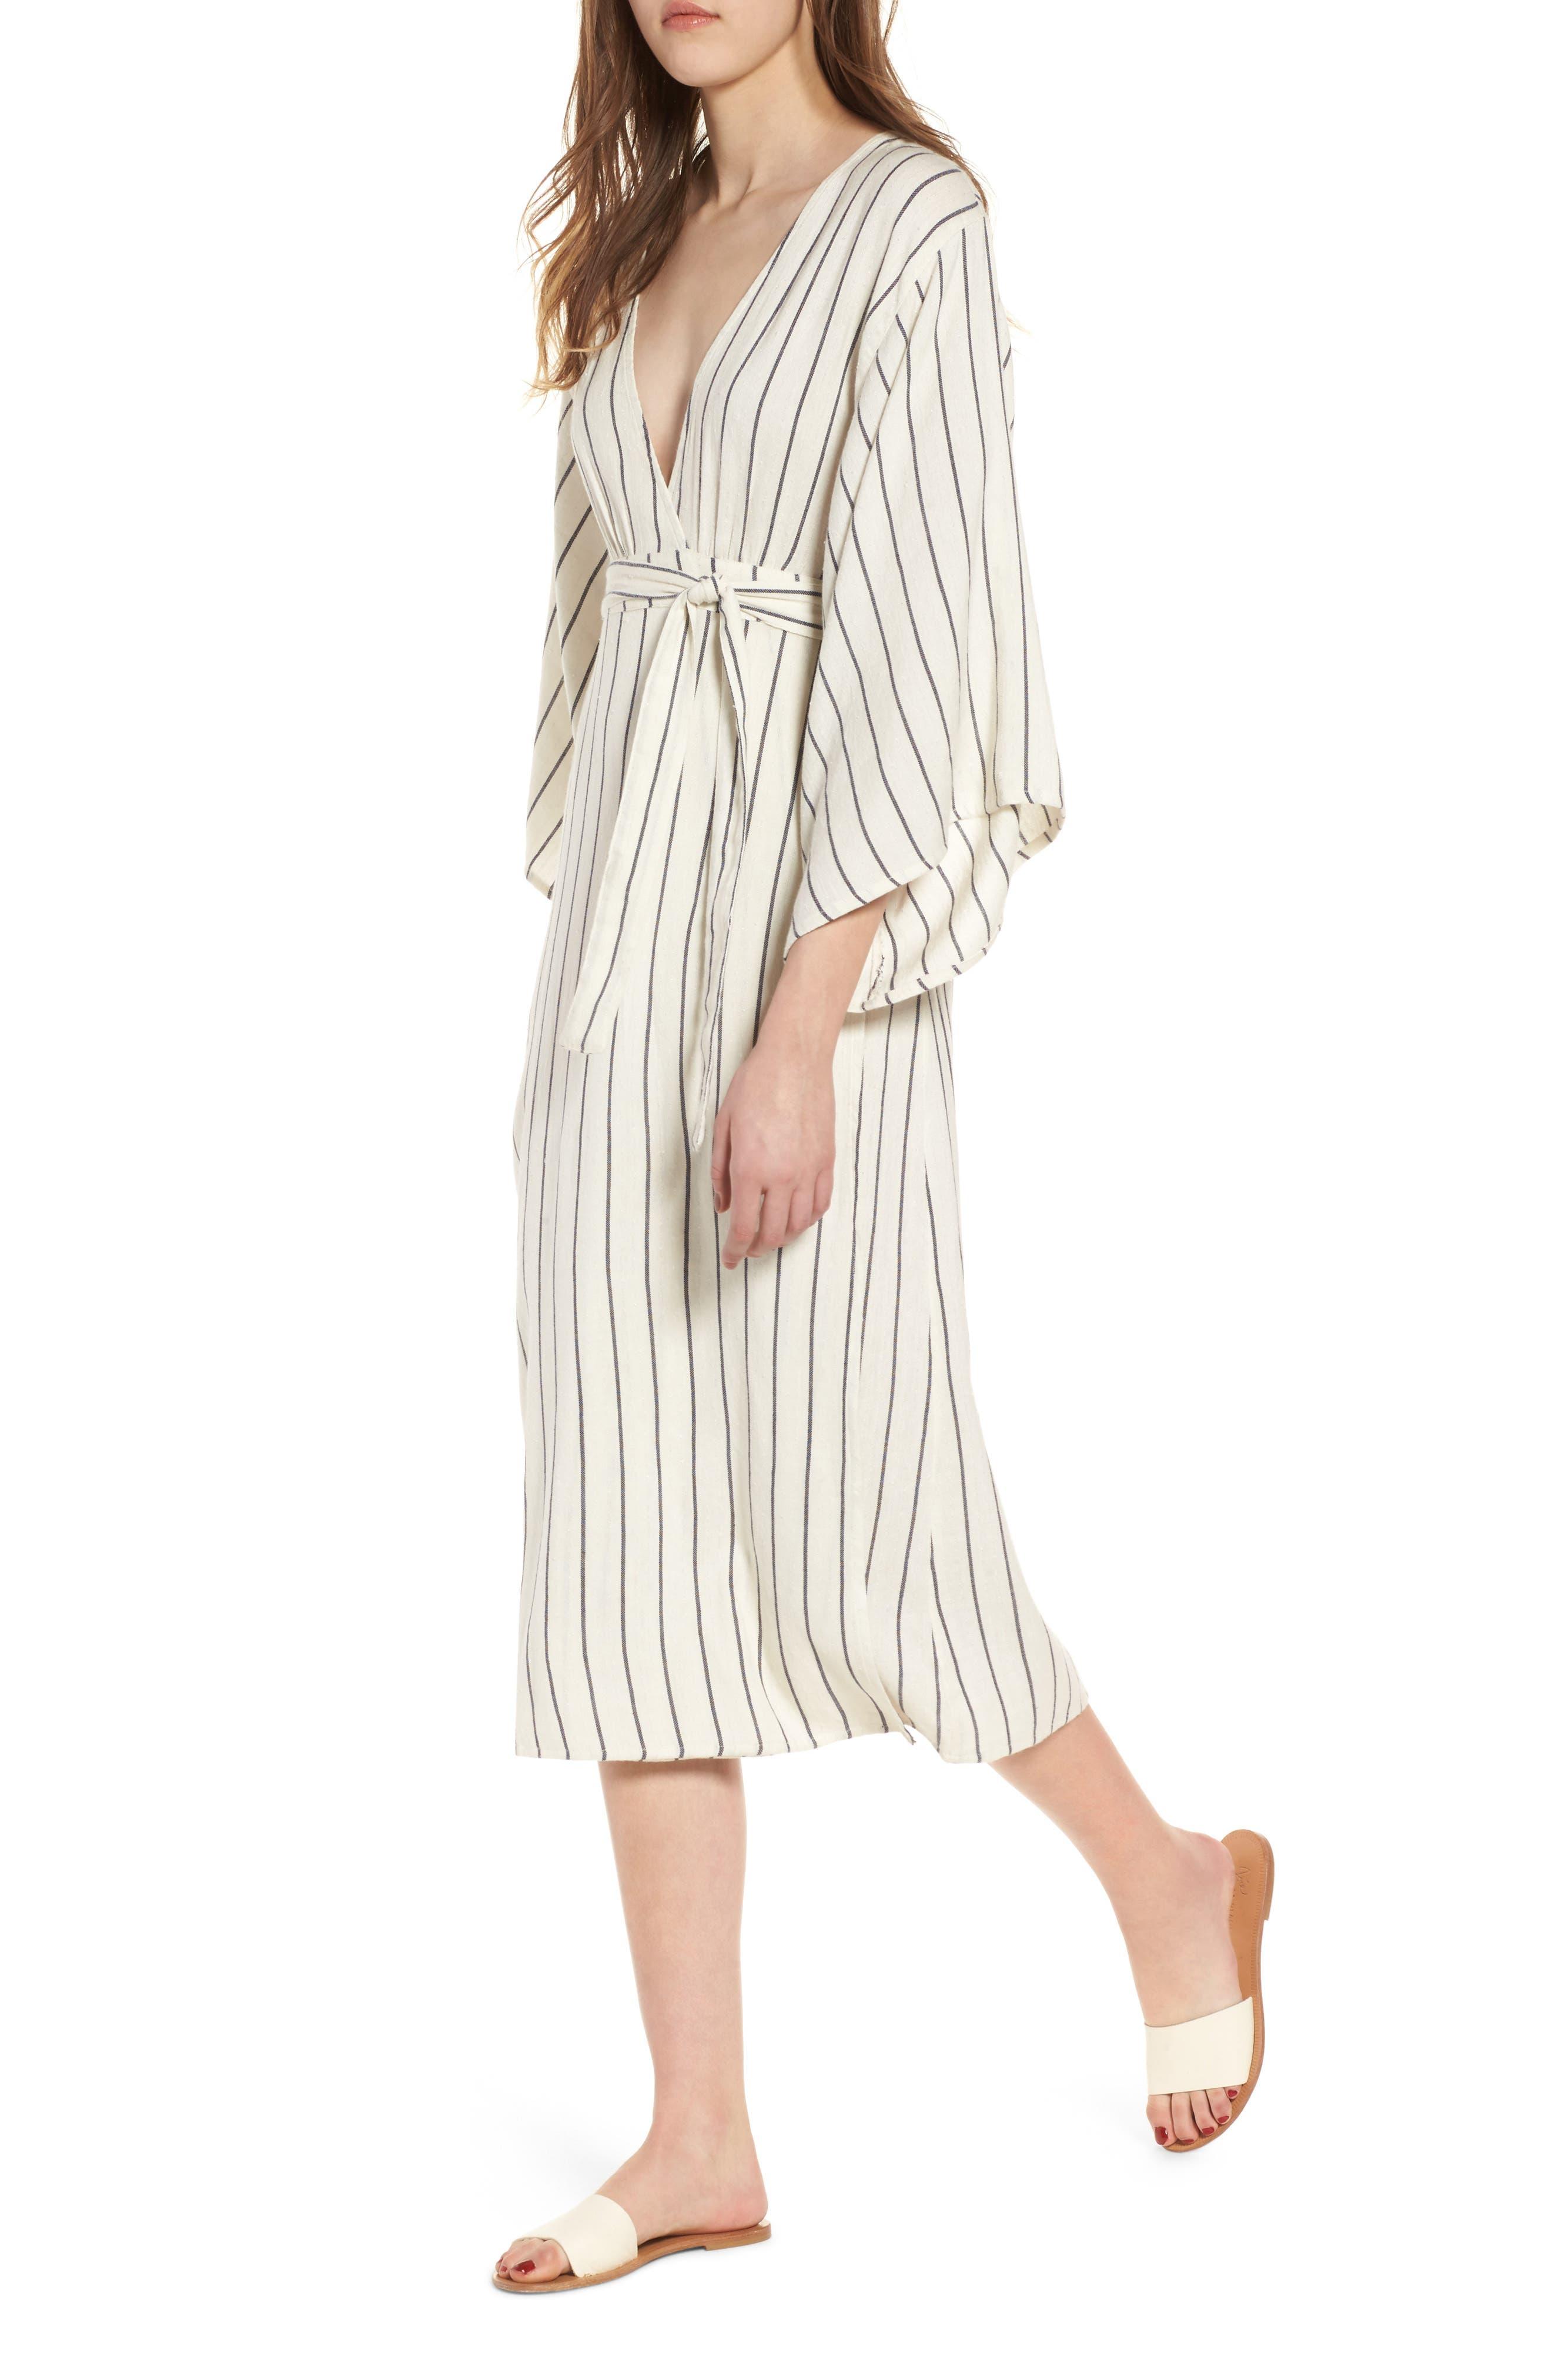 Robe Life Striped Midi Dress,                         Main,                         color, Cool Wip